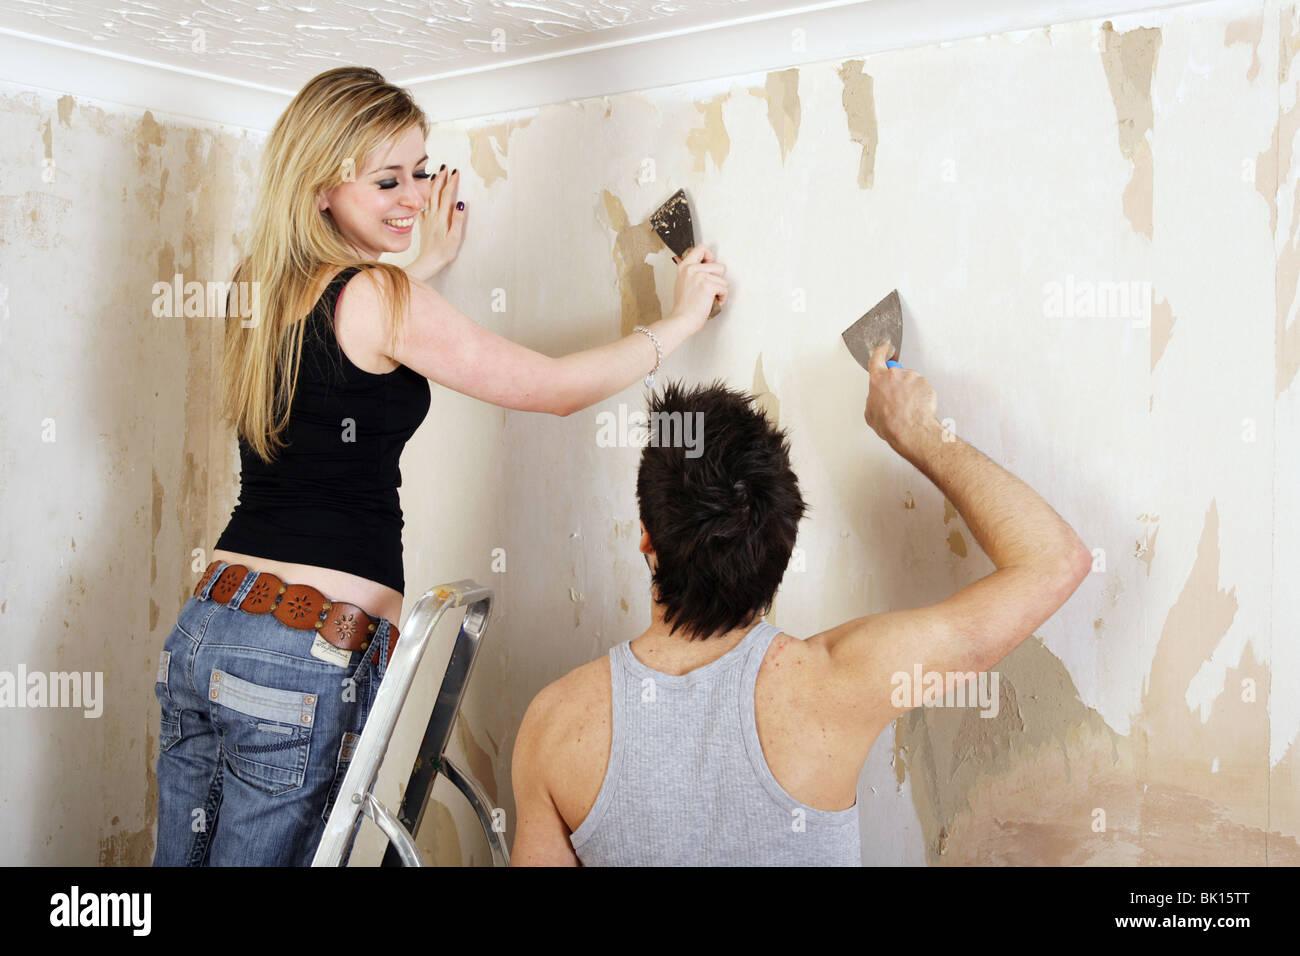 Young Couple Having Fun Stripping Wallpaper